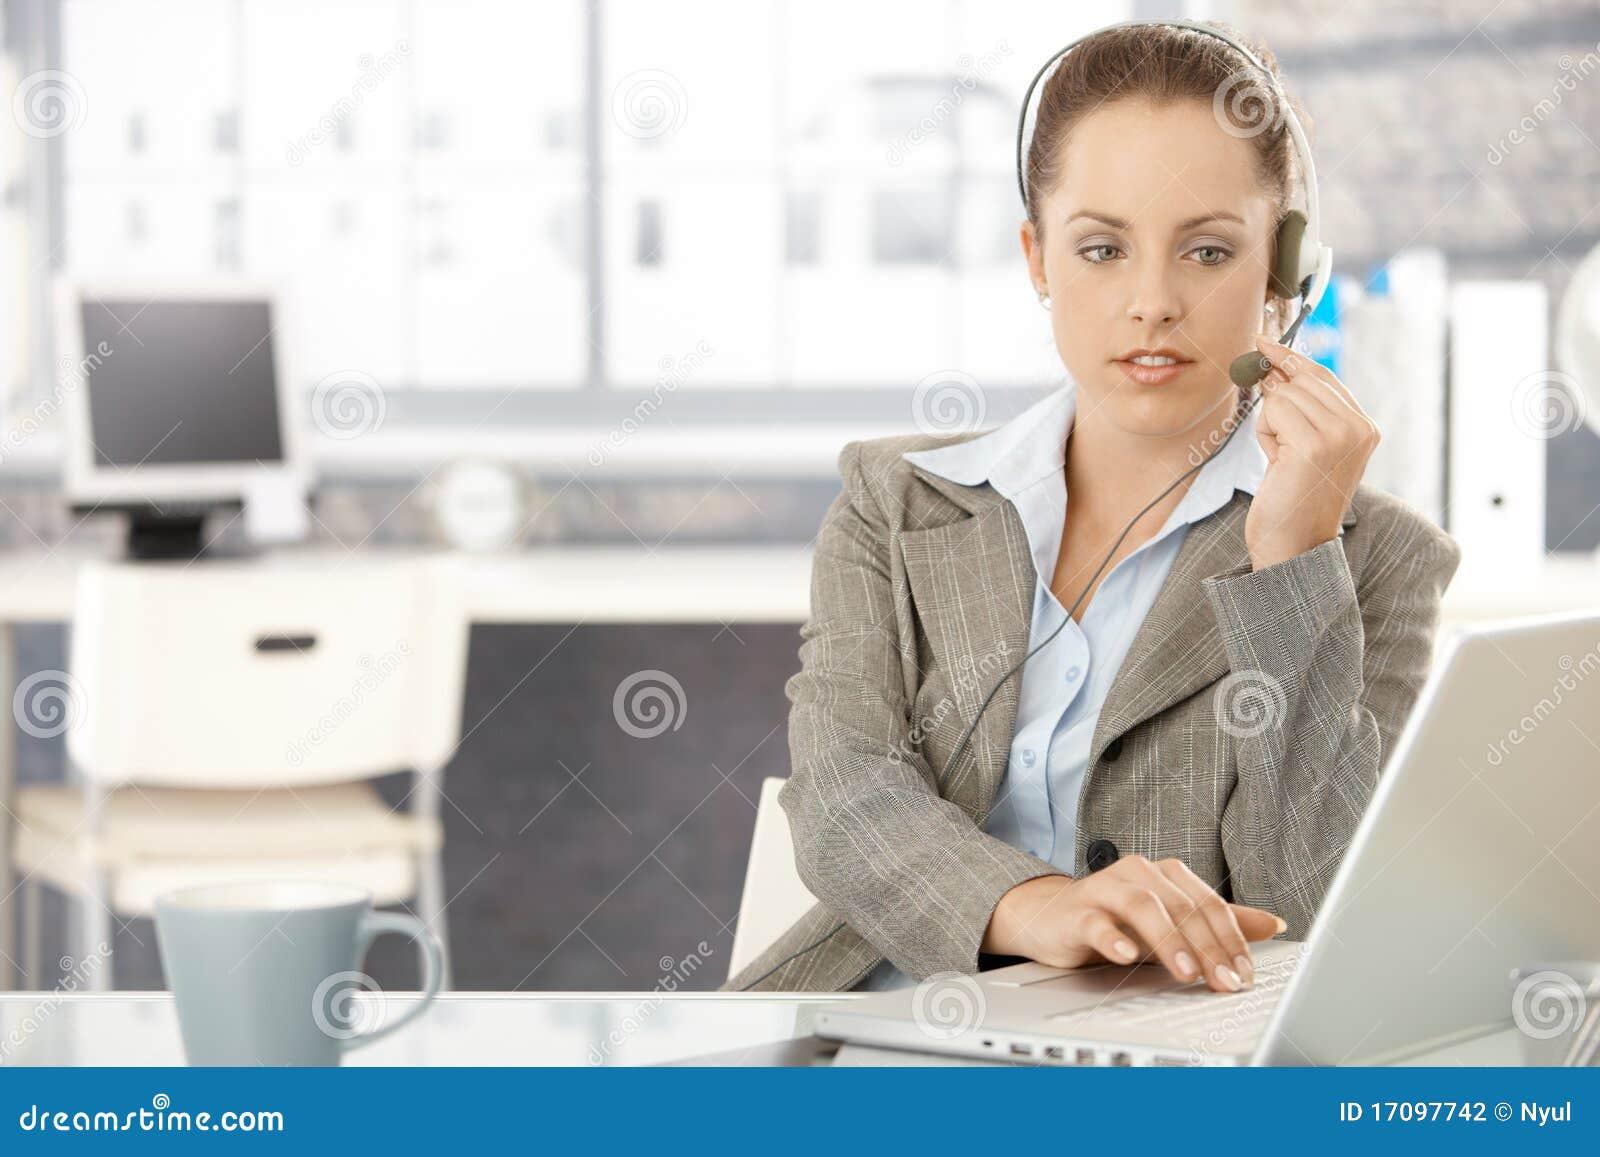 Attractive dispatcher working in bright office